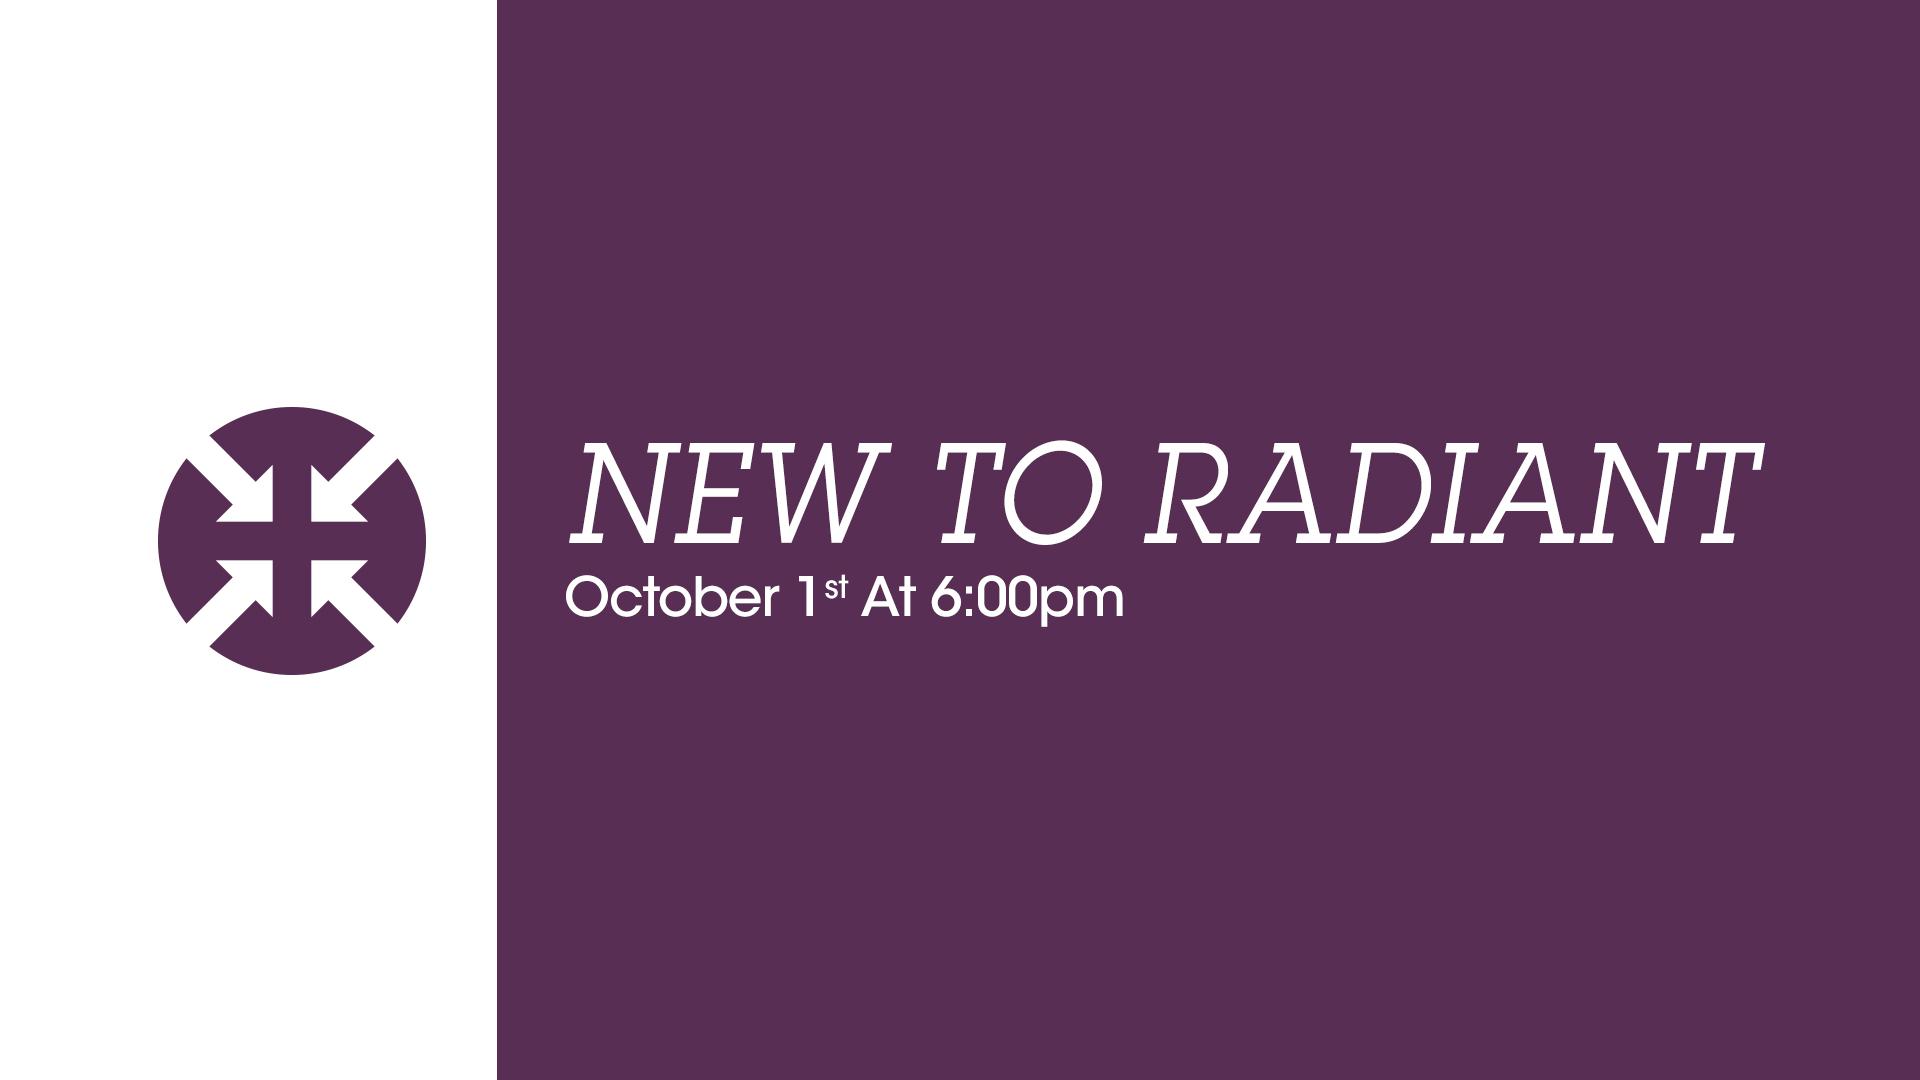 New-to-radiant_10-01-17.jpg